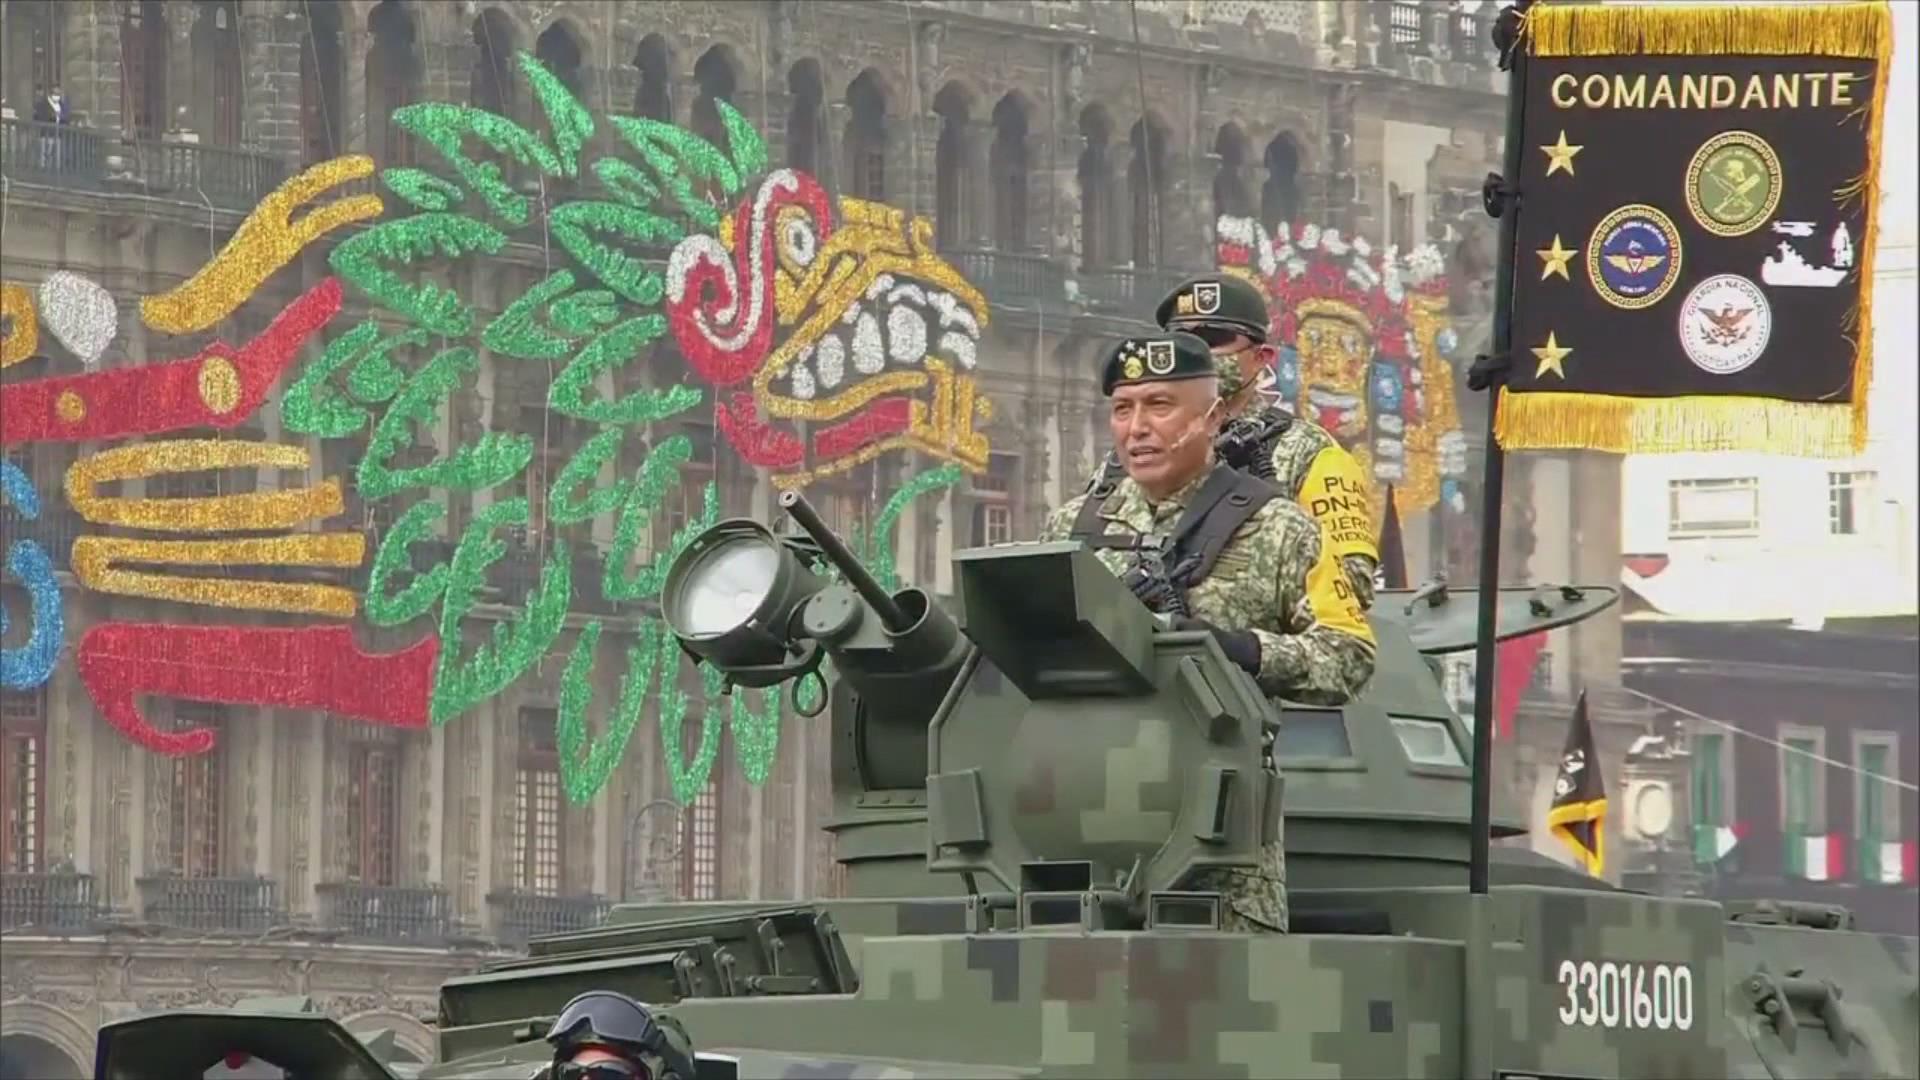 México conmemora inicio de gesta independentista con tradicional desfile militar